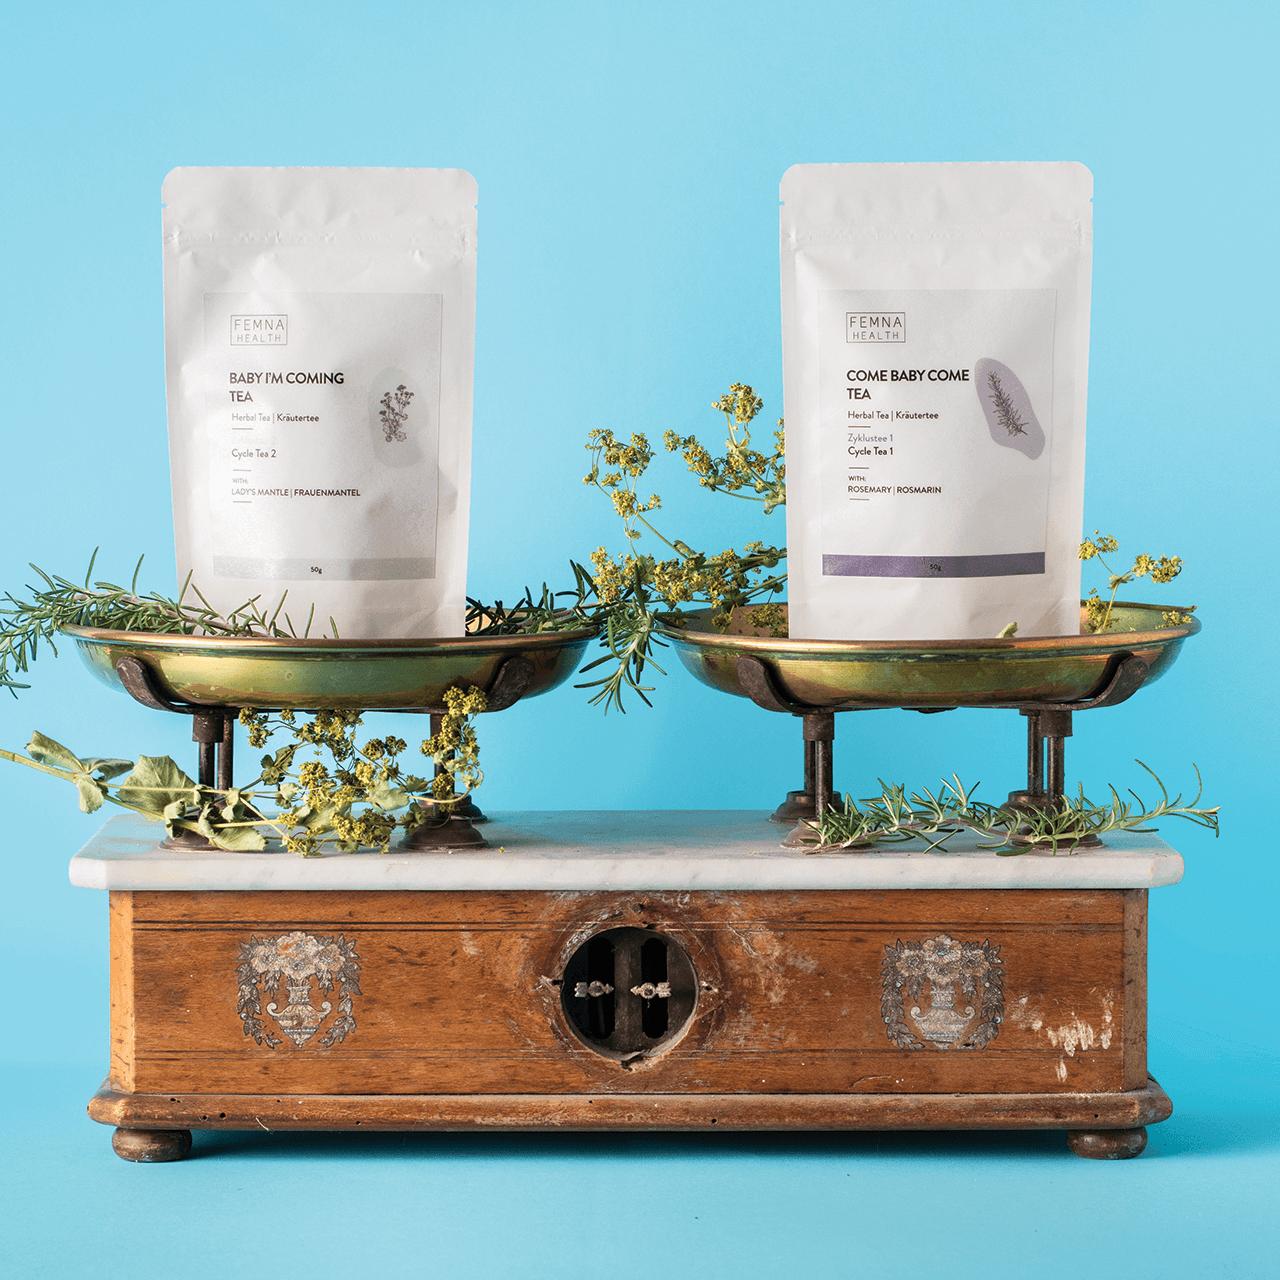 Packaging for Femna's herbal teas